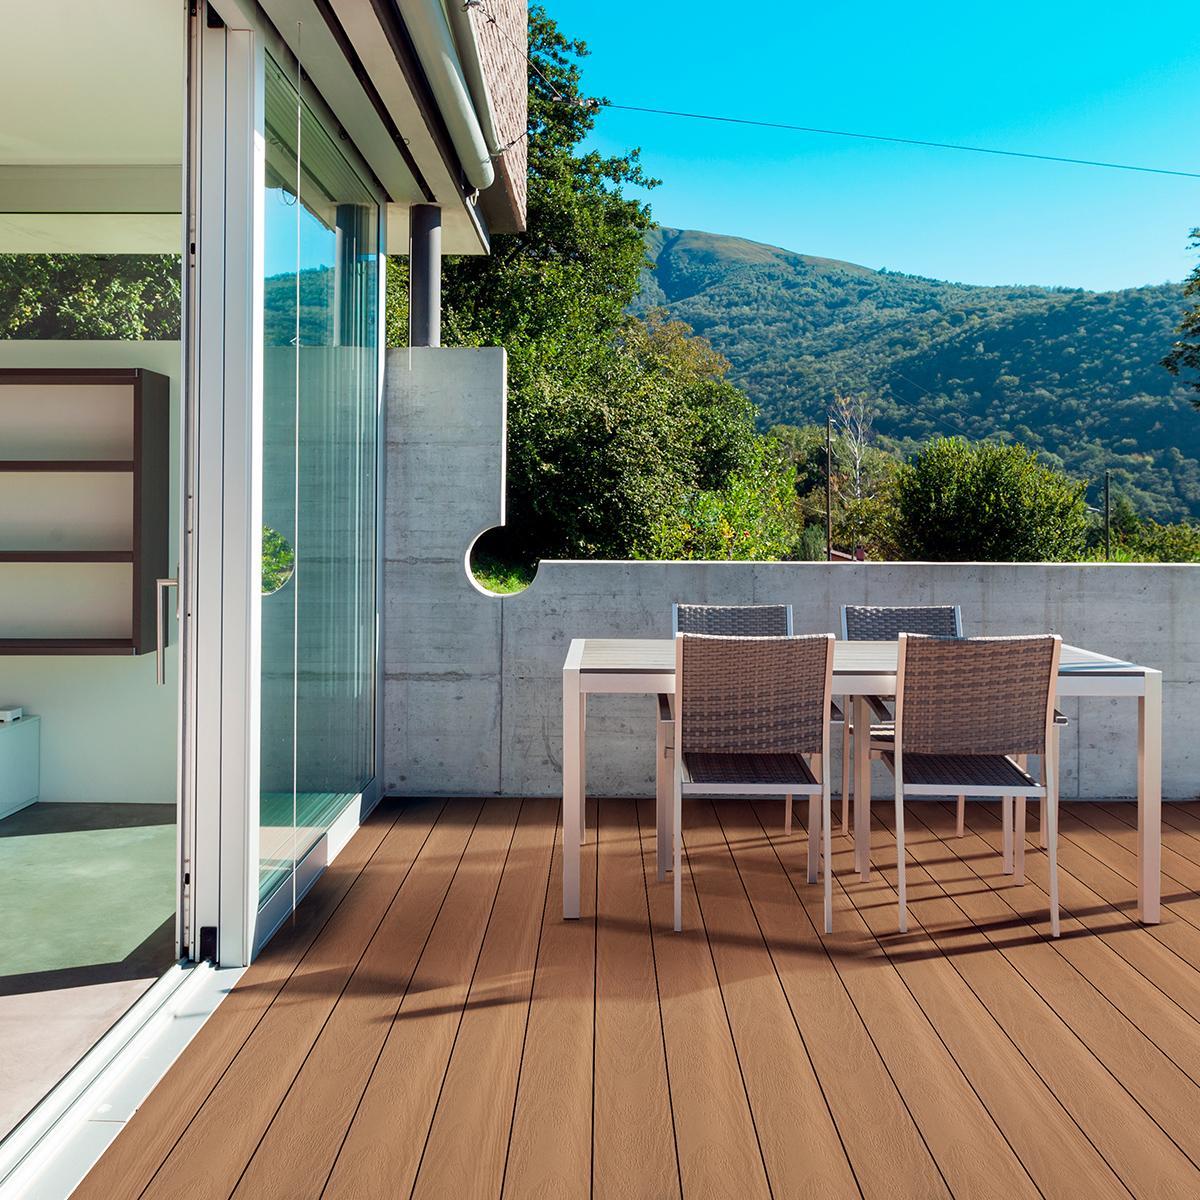 Piso Deck Sand Beige Mate - 14X290 - 0.42 m2